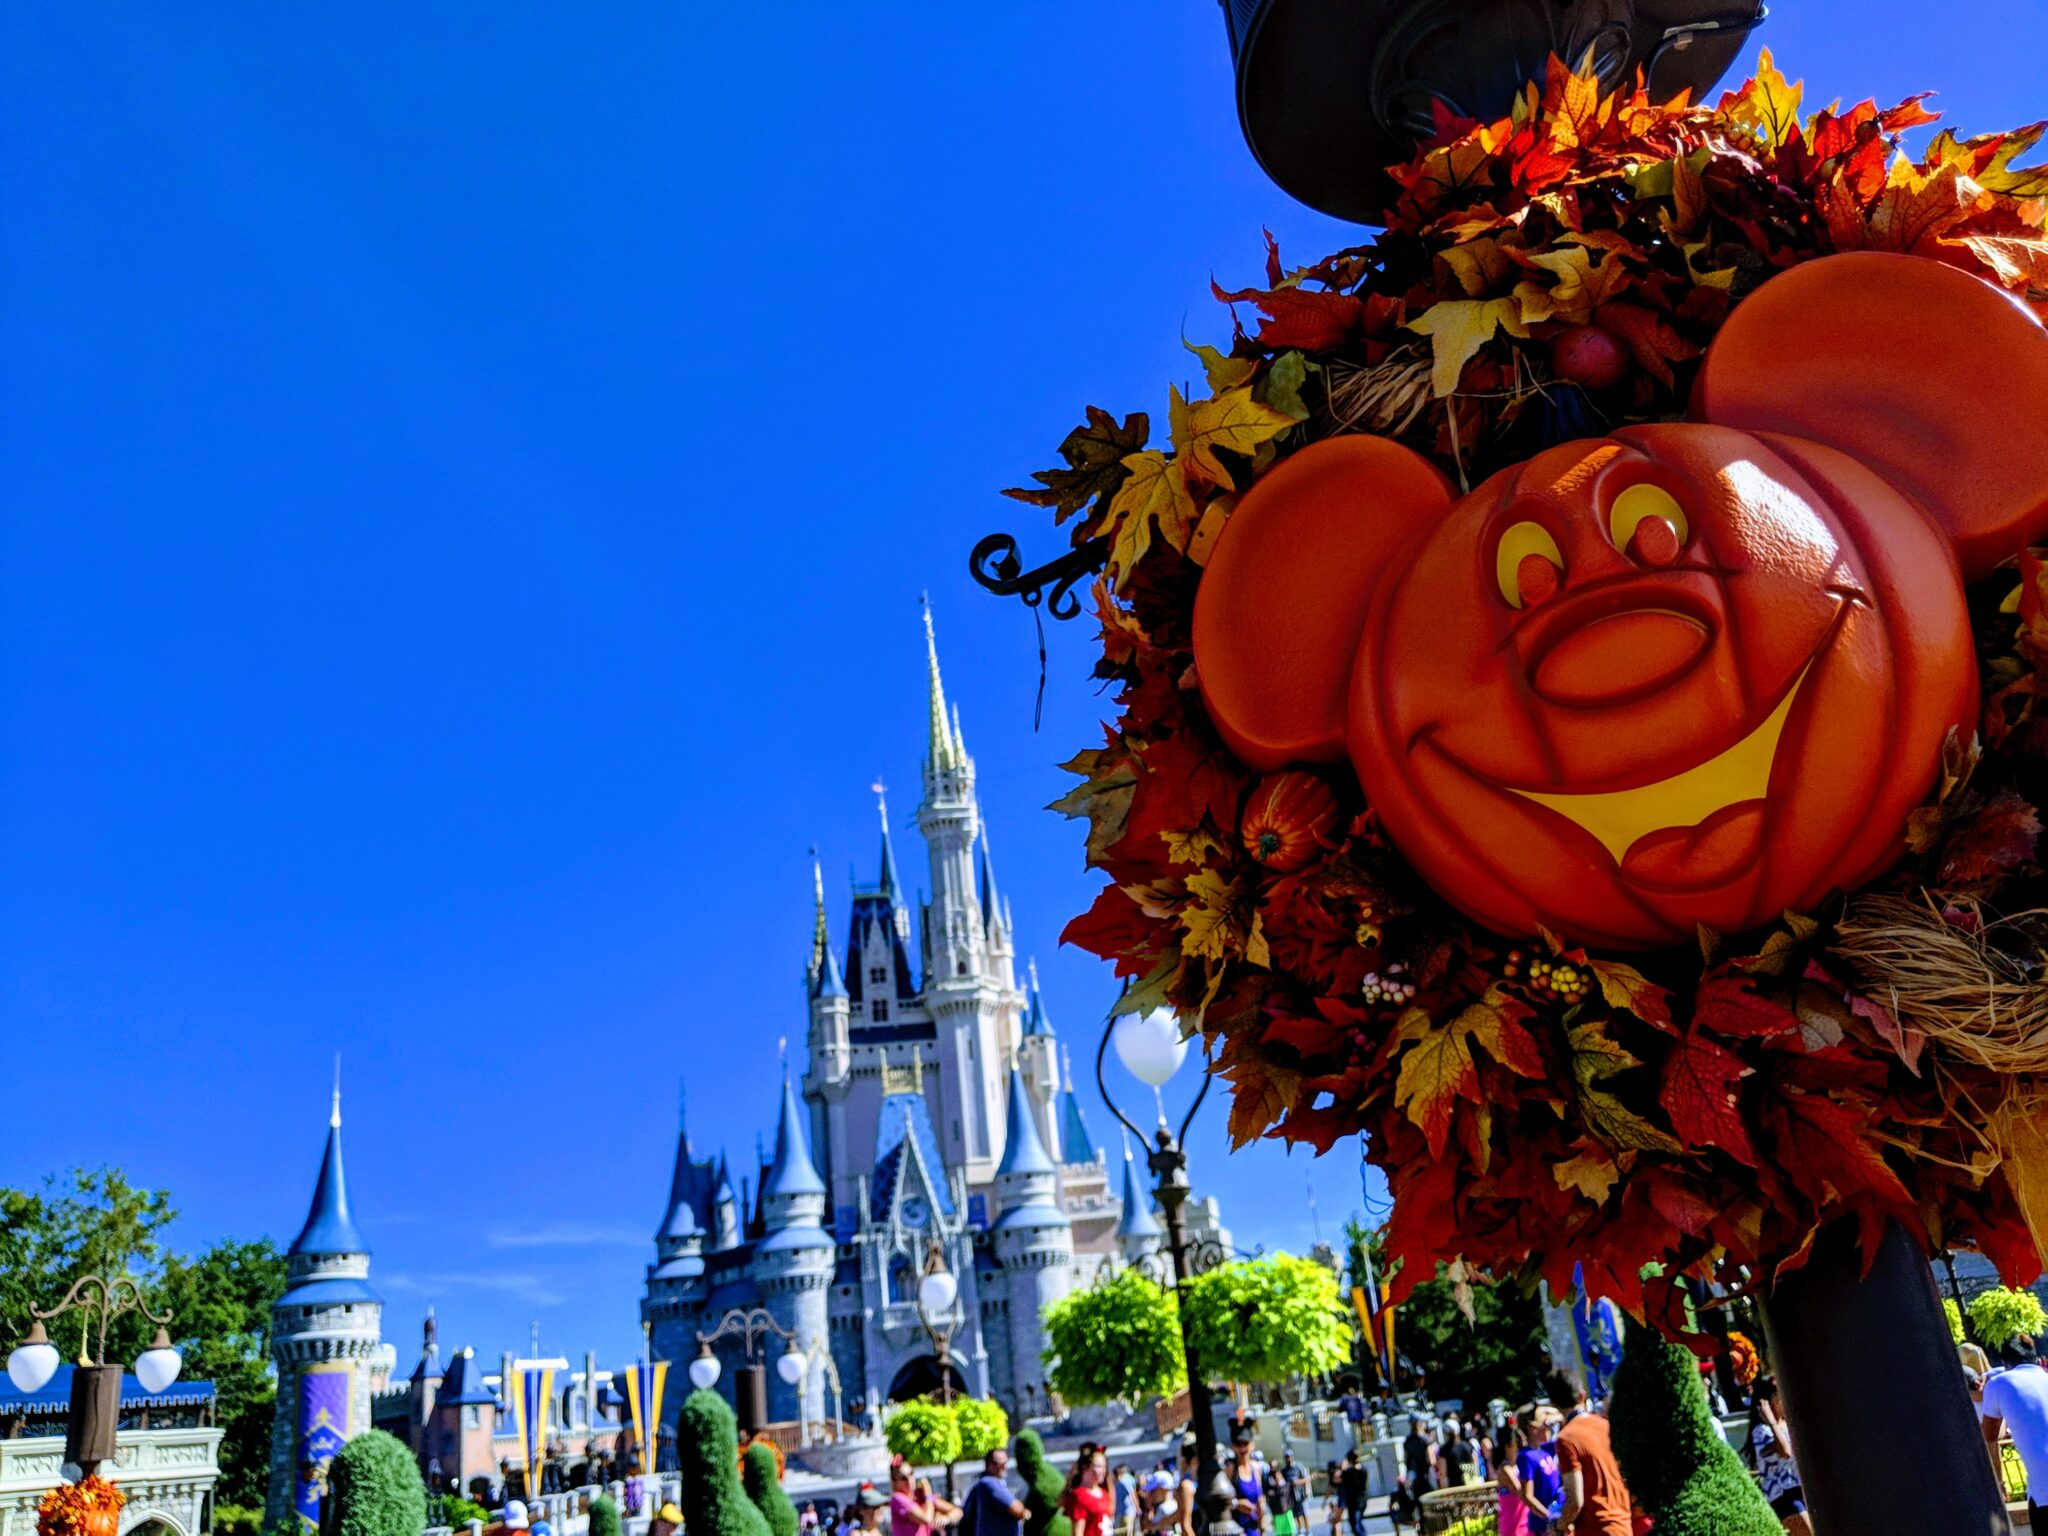 Mickey's Not So Scary Halloween Party tips everyone needs.